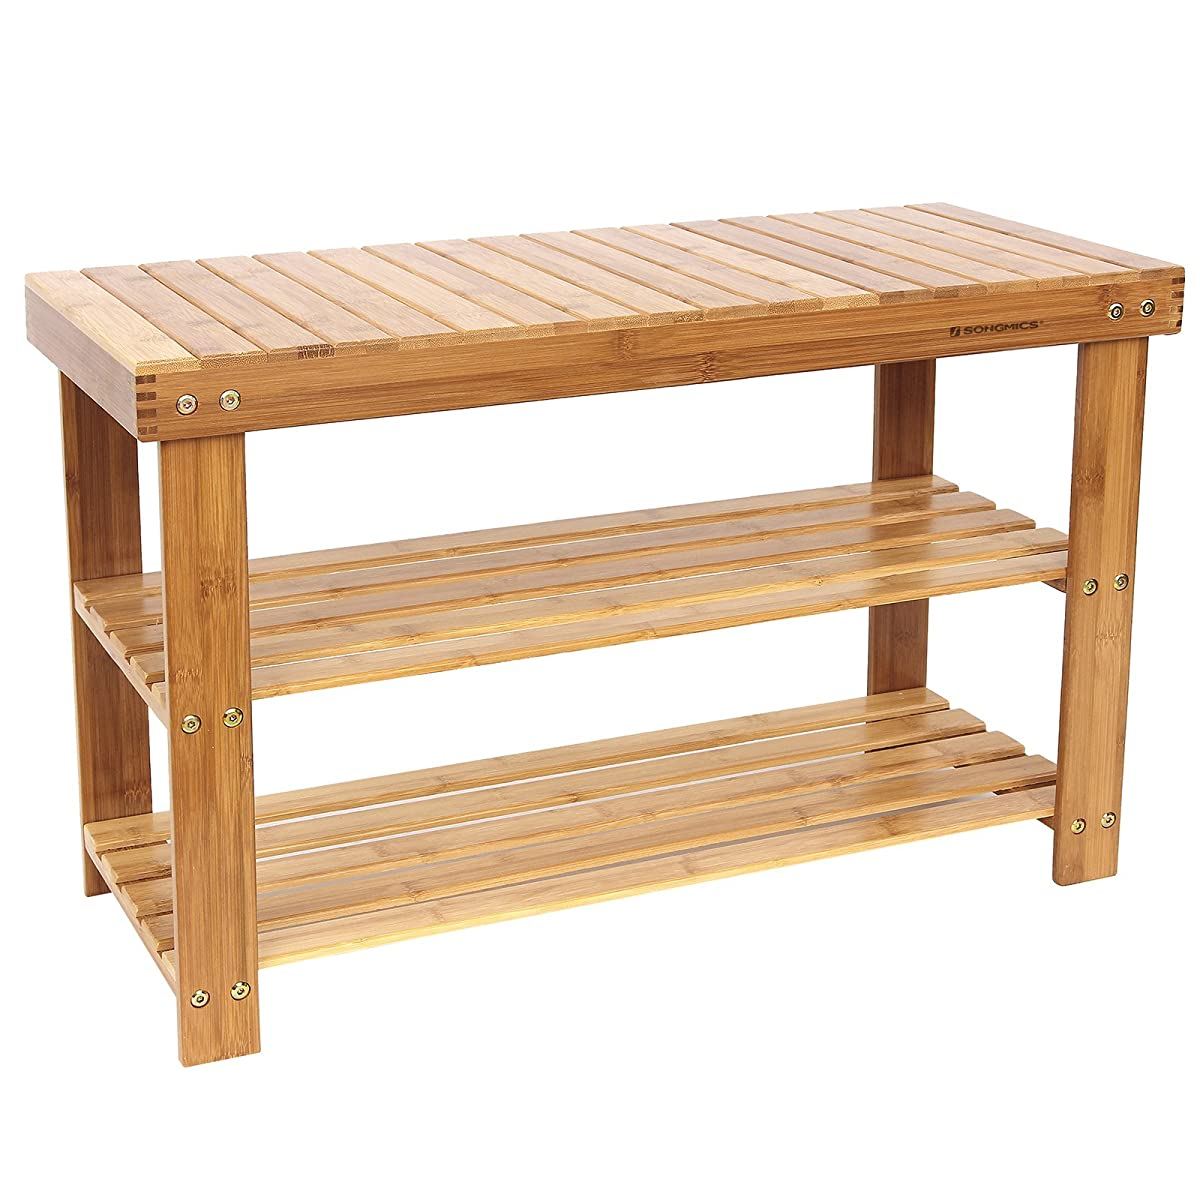 SONGMICS 100% Natural Bamboo Shoe Bench 2-Tier Shoe Storage Racks Shelf Organizer ULBS04N